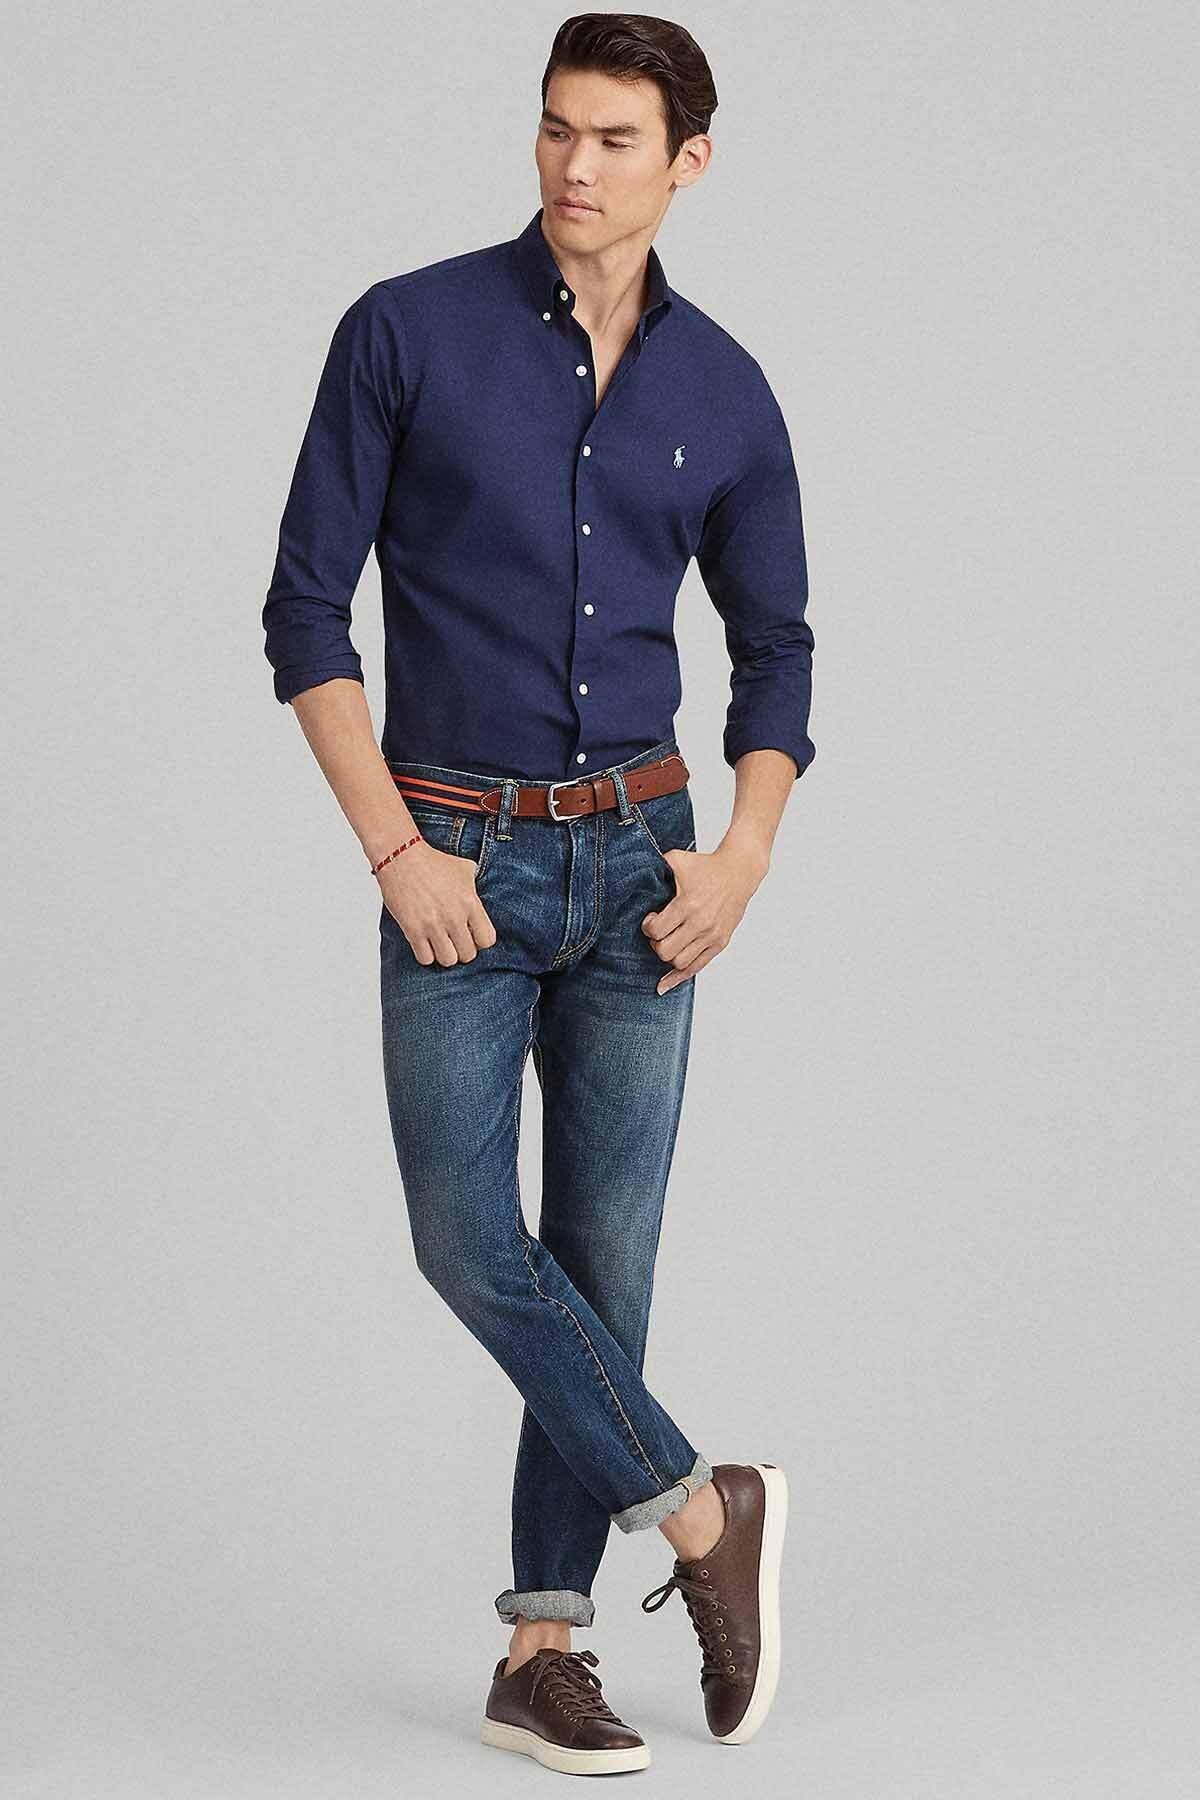 Polo Ralph Lauren Erkek Lacivert Slim Fit %100 Pamuk Stretch Gömlek 2